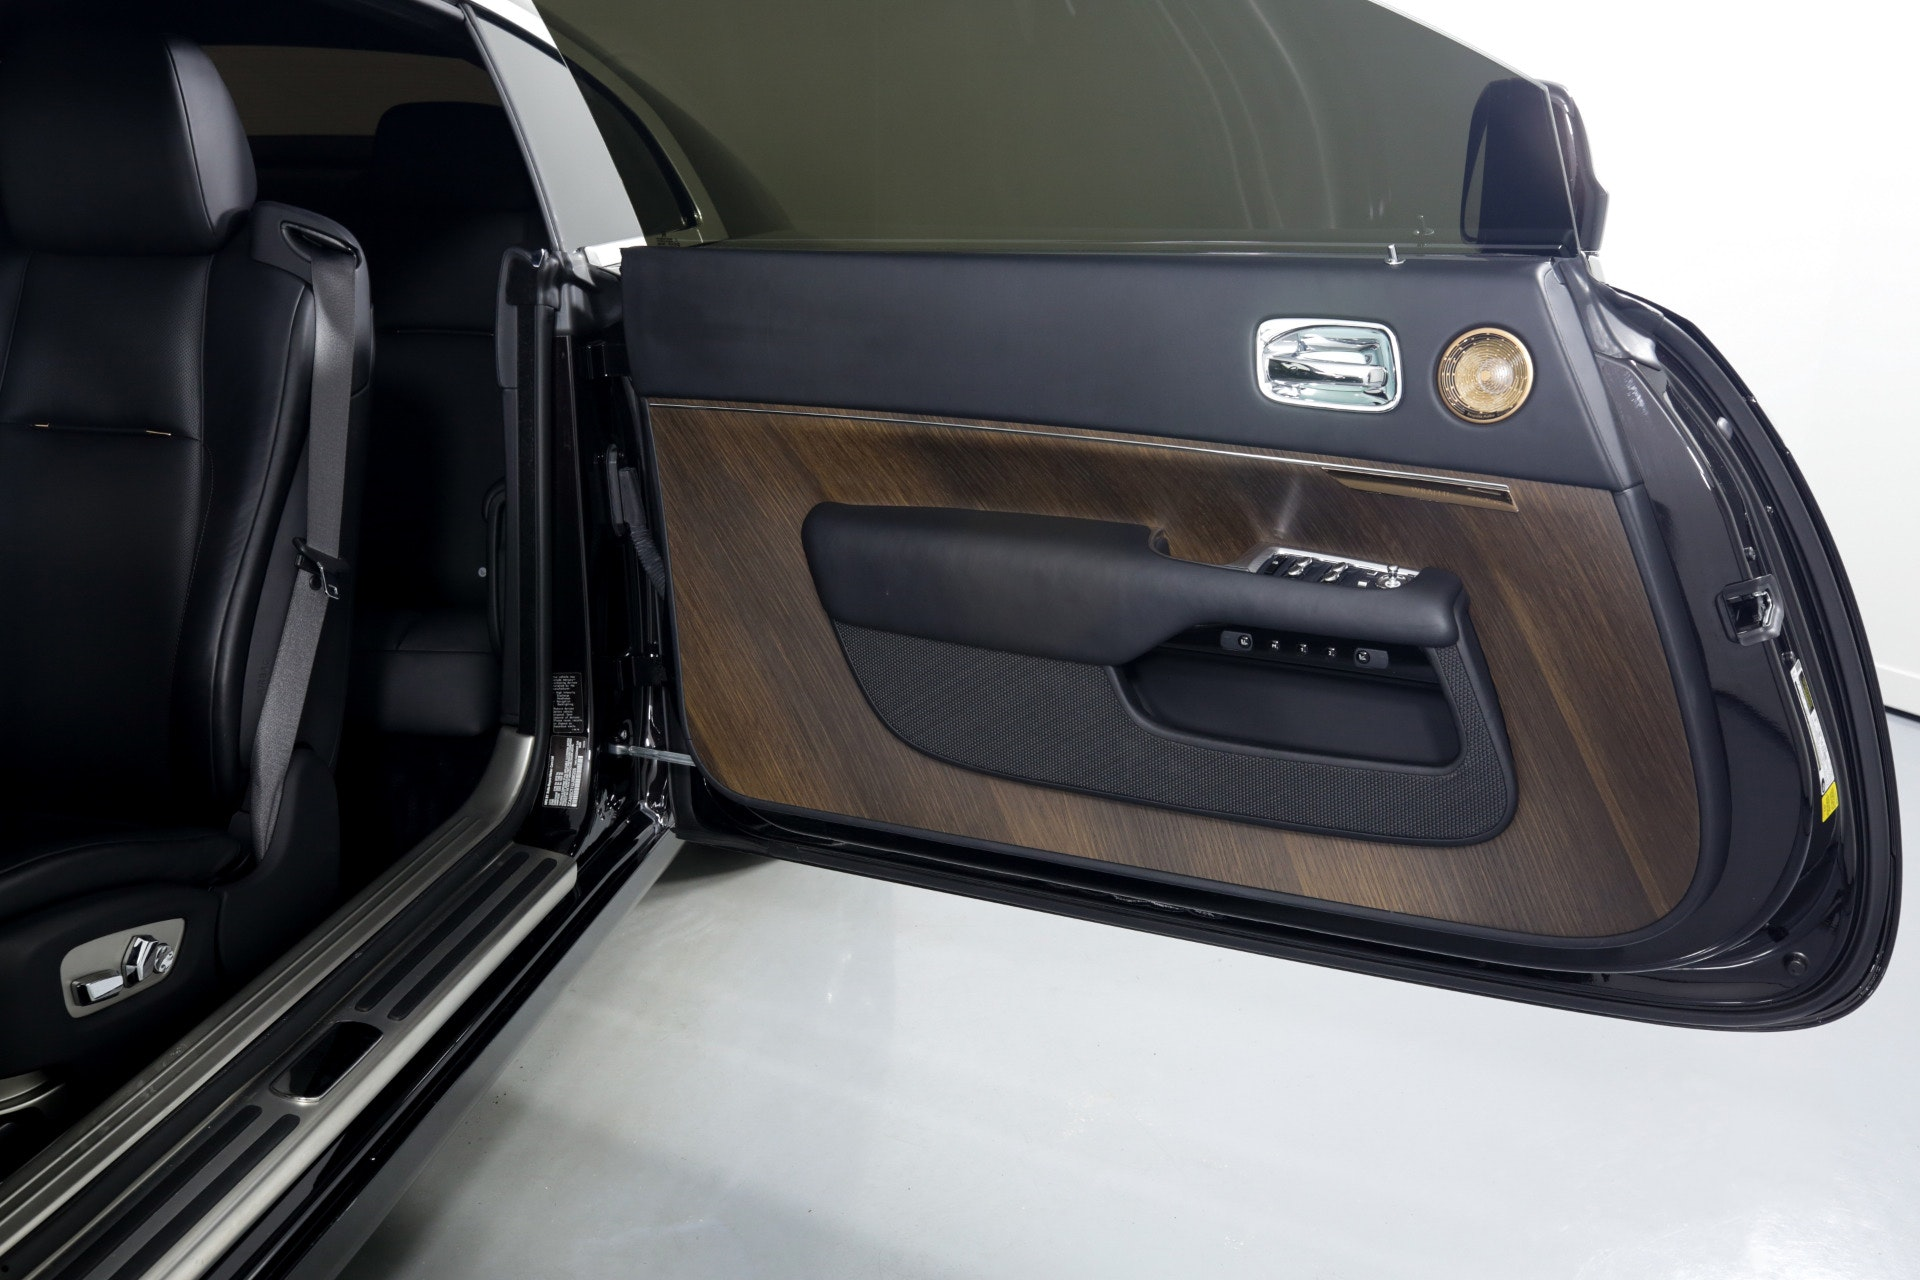 Miami Rolls Royce Wraith image #2